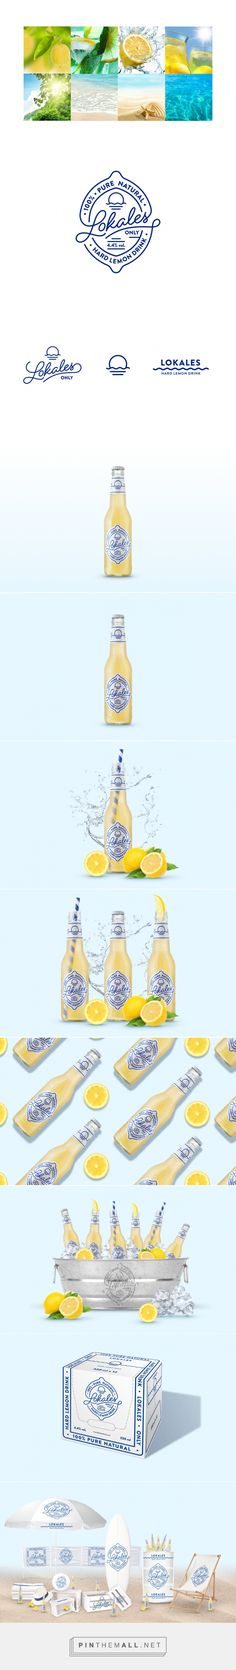 Lokales alcoholic lemonade packaging design by LANGE & LANGE - http://www.packagingoftheworld.com/2017/01/lokales.html